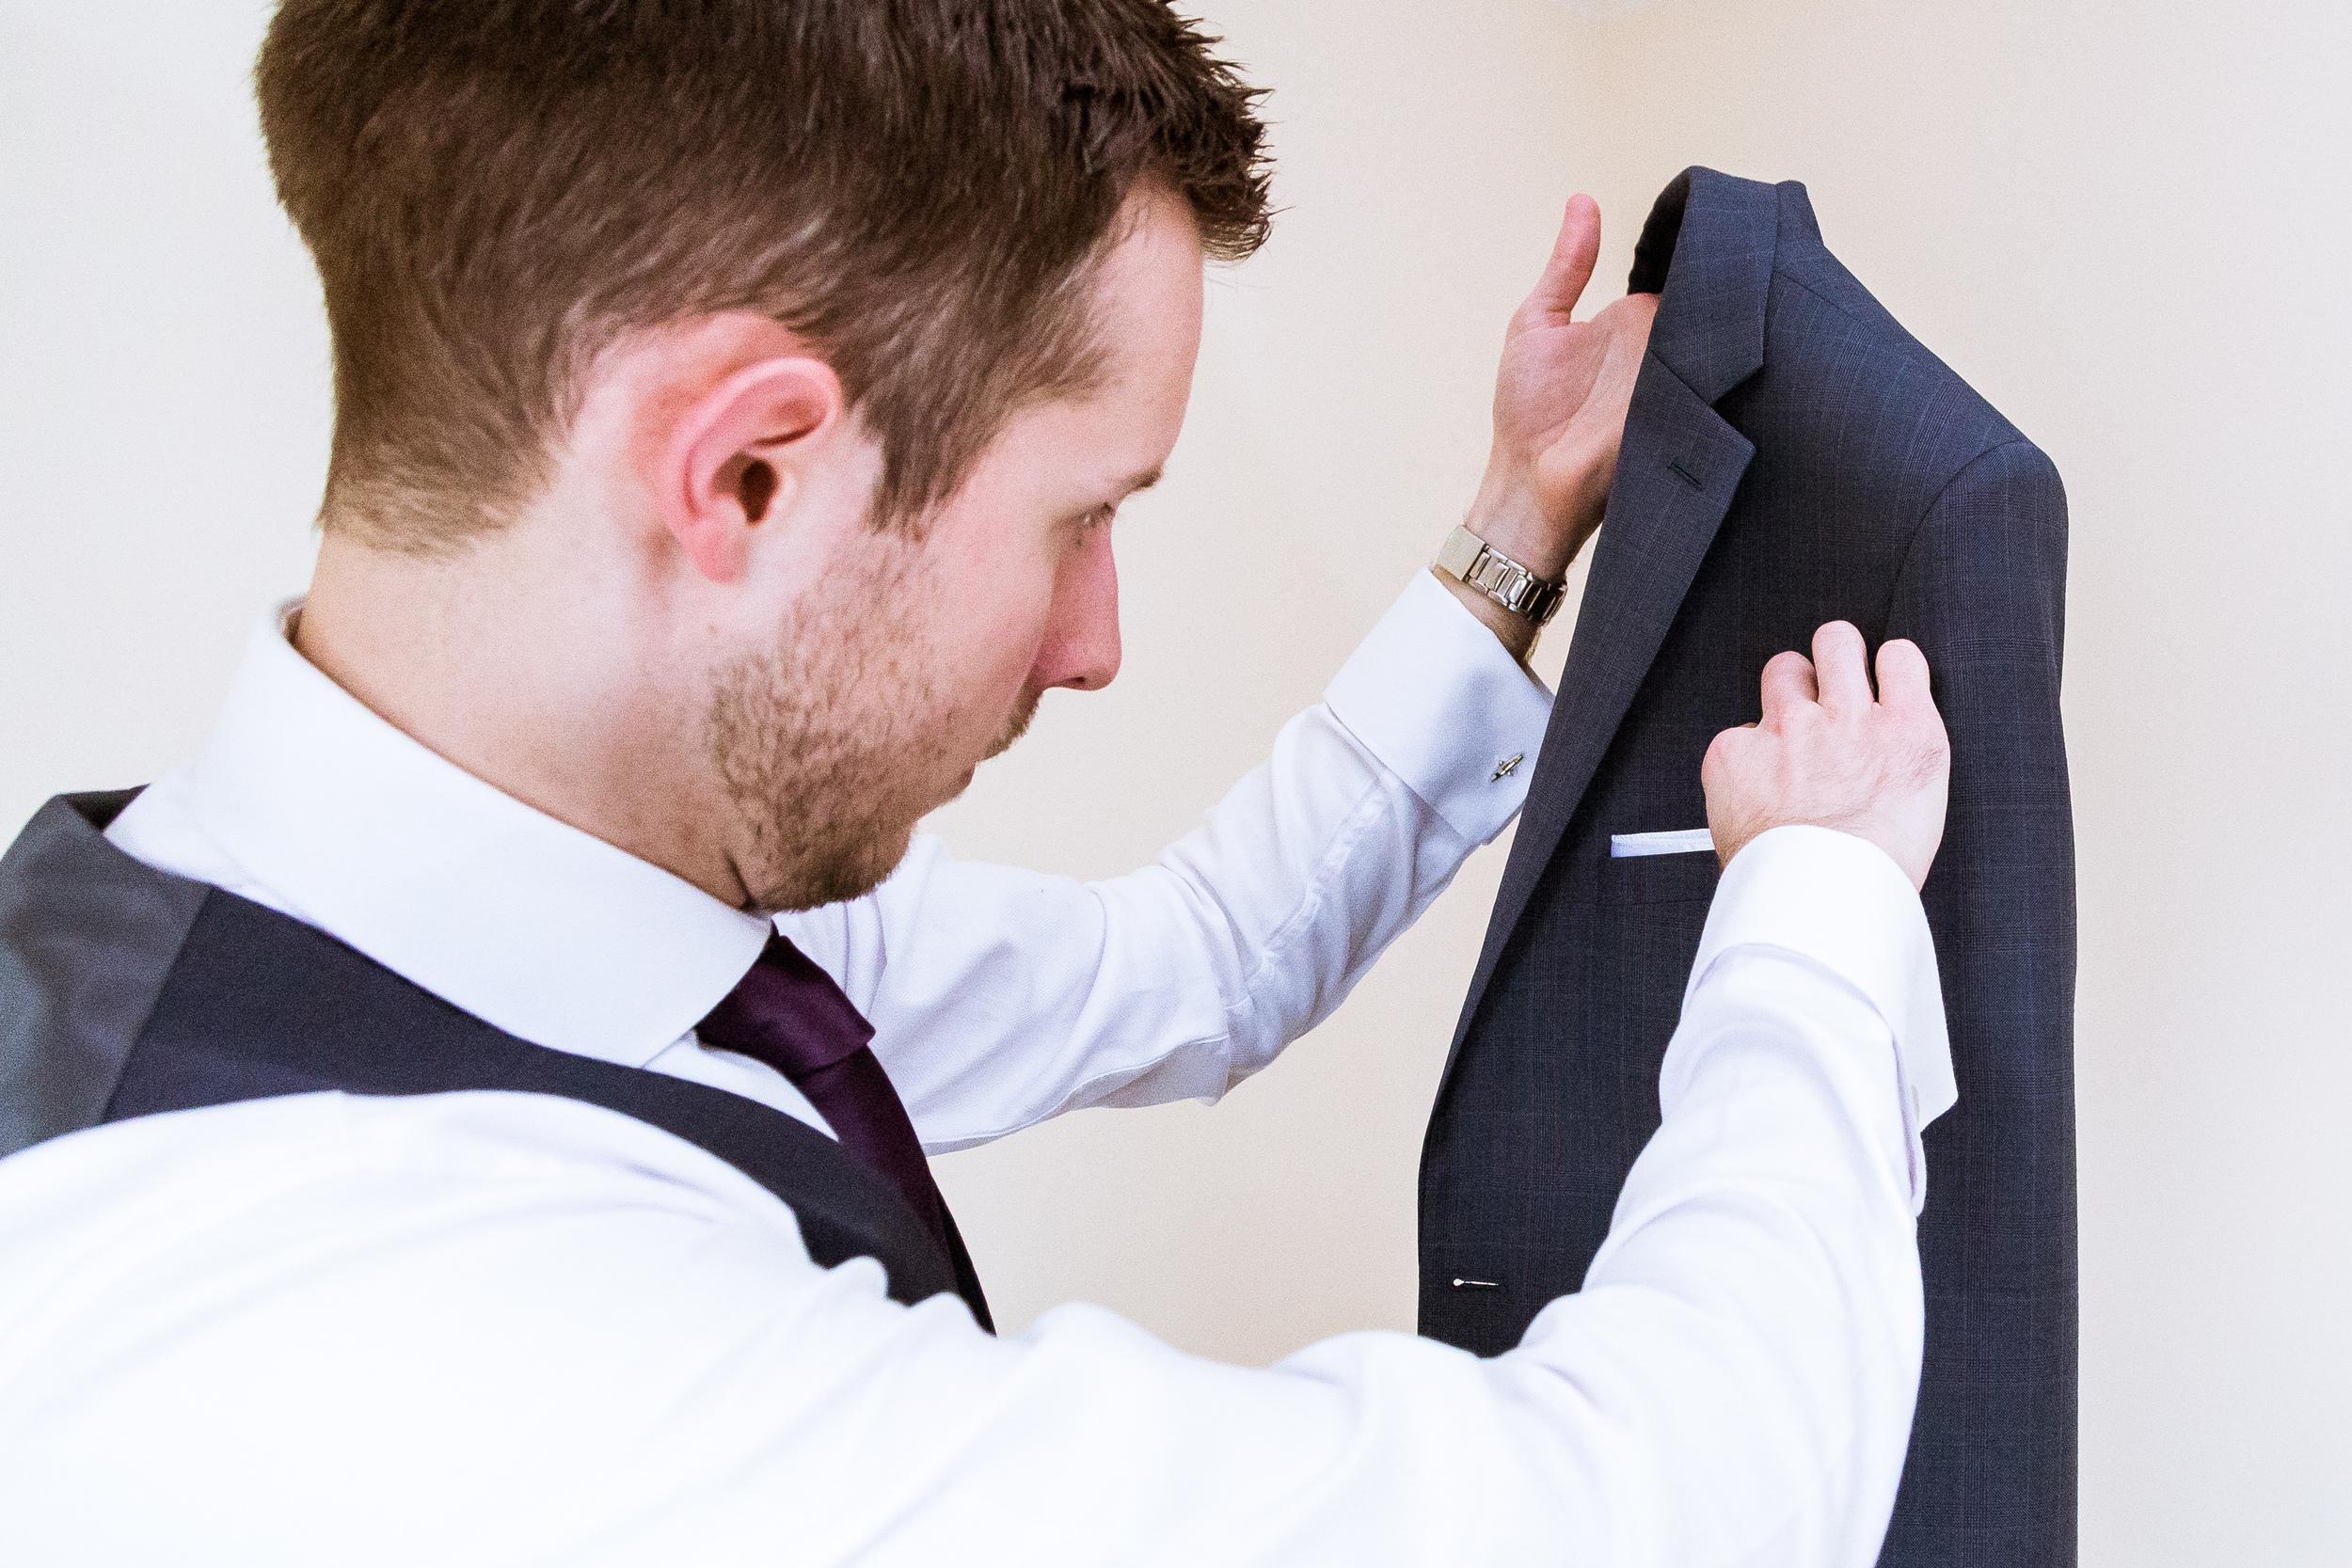 Groom - Prep - Suit going on -  wedding